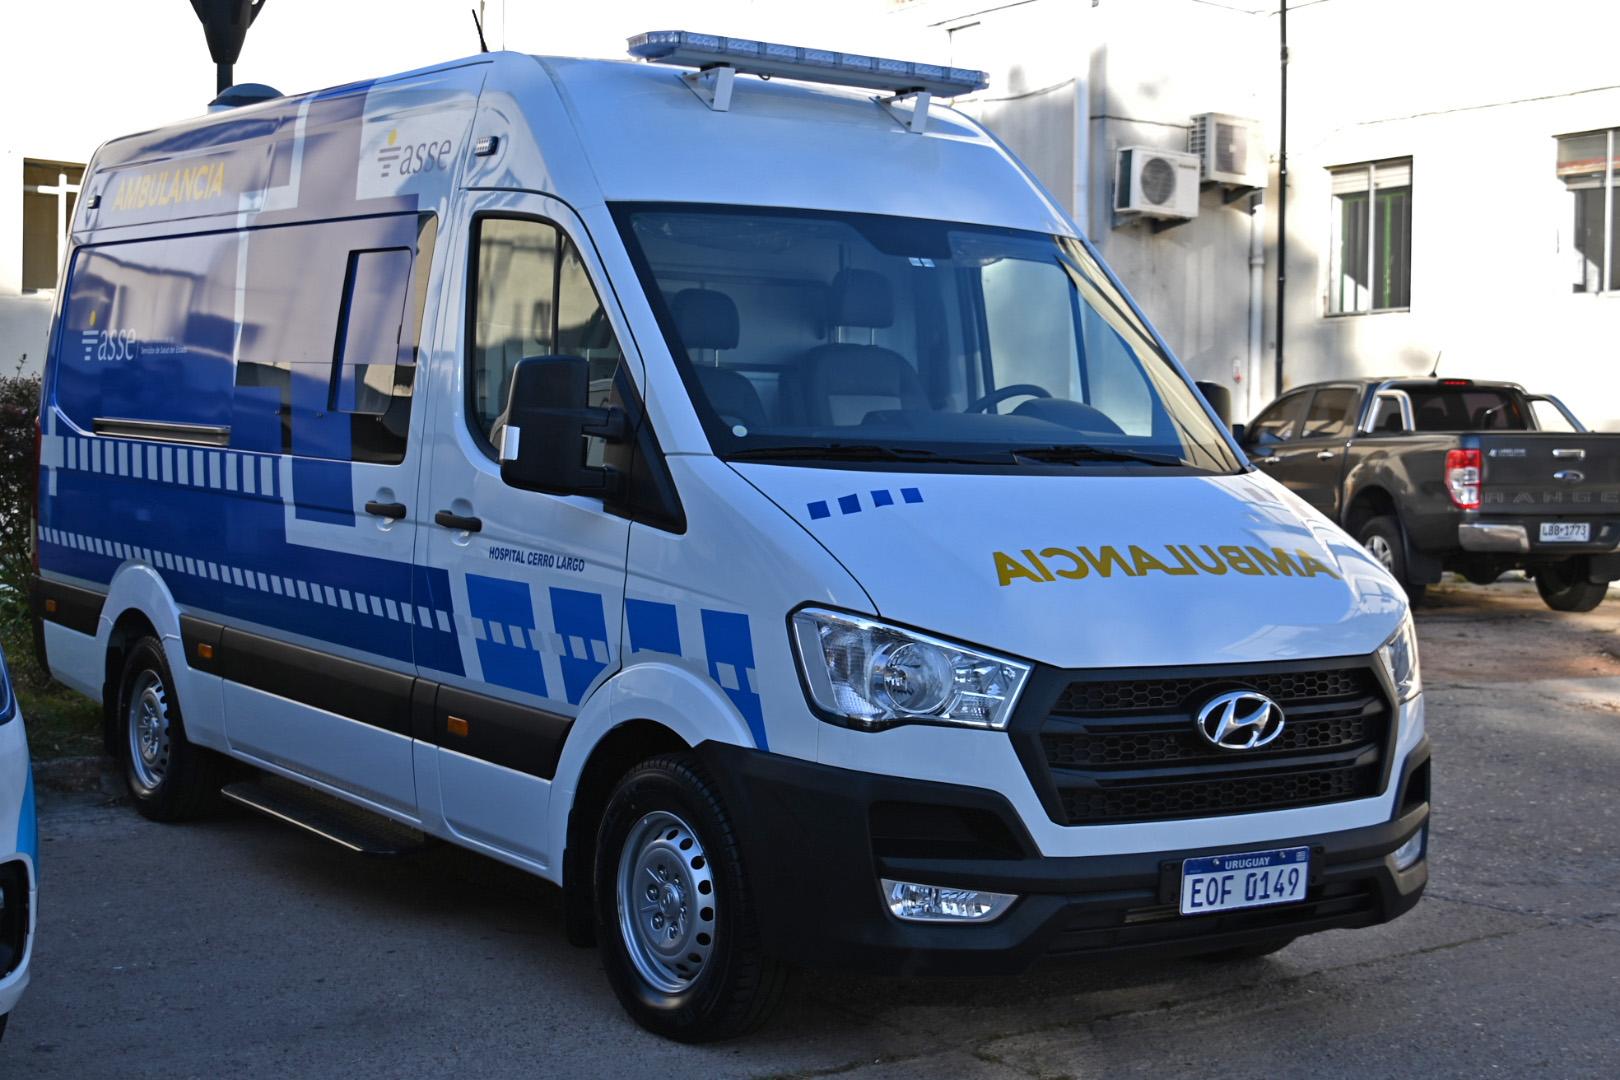 Entrega de una ambulancia en Hospital de Melo